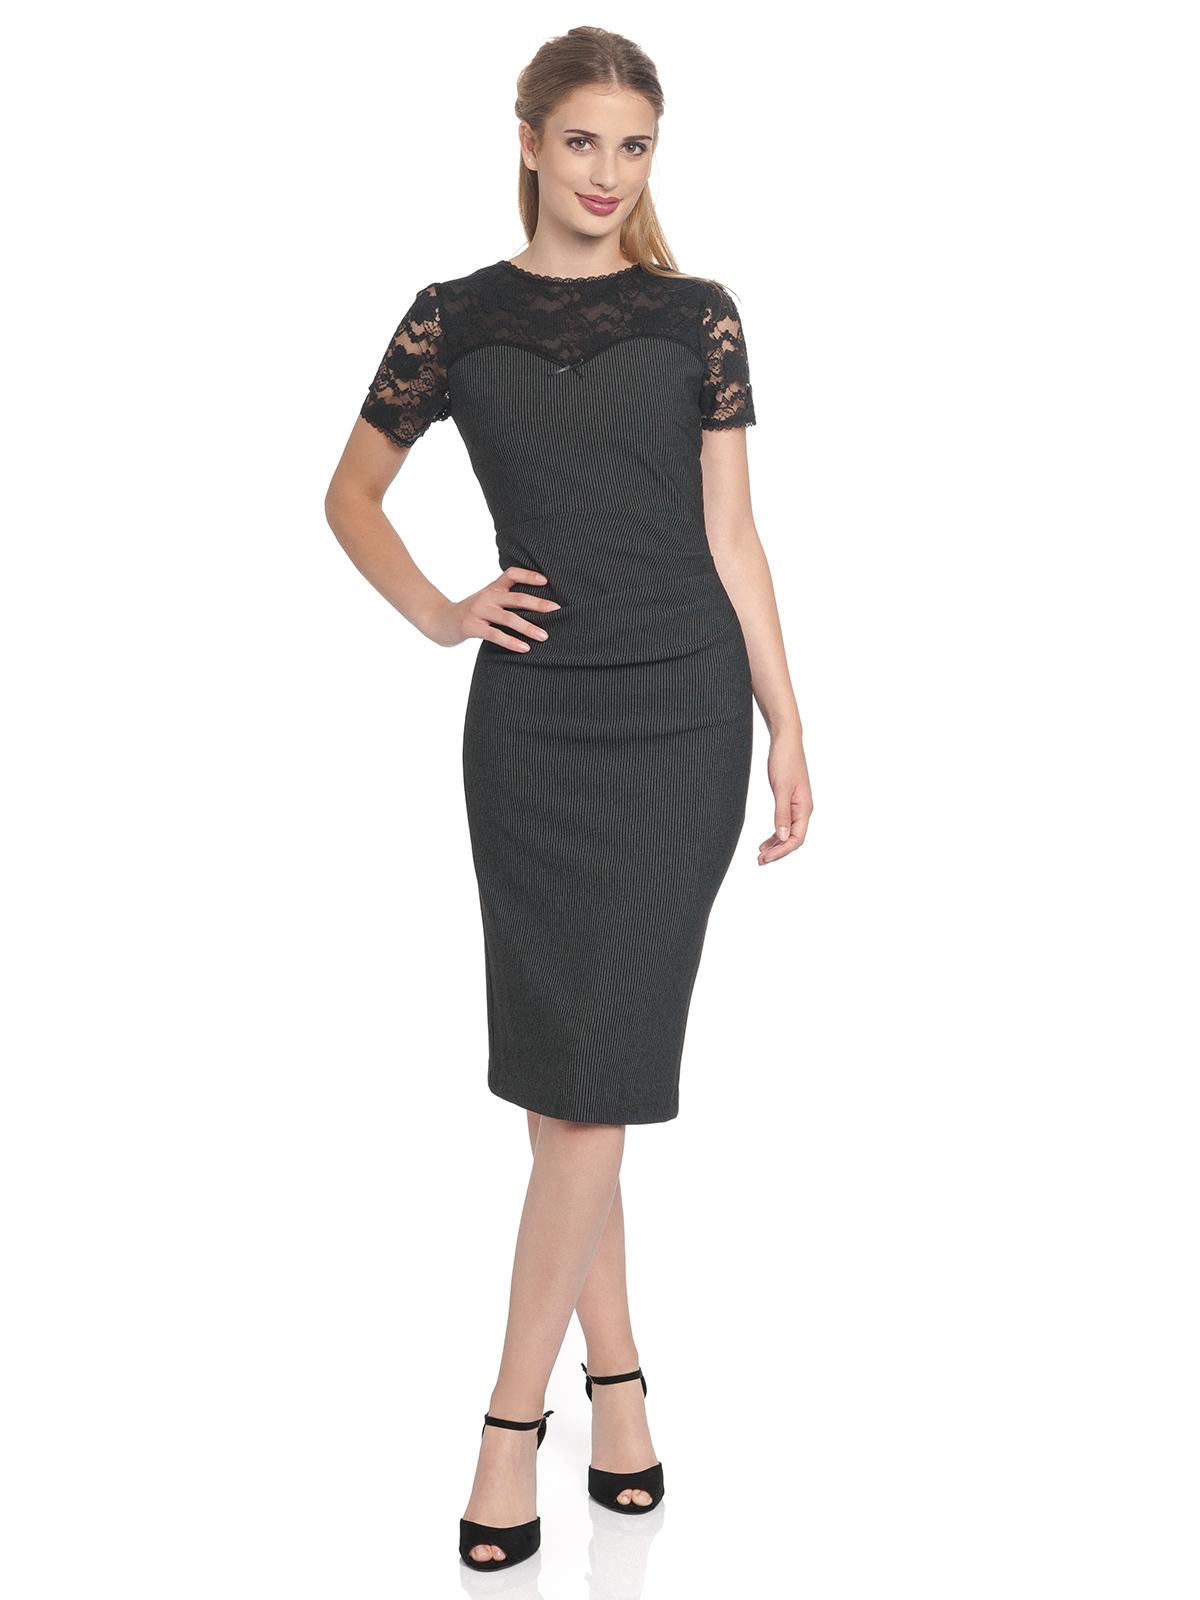 08f30ca506f Vive Maria Dandy Shape Dress Black Women dresses